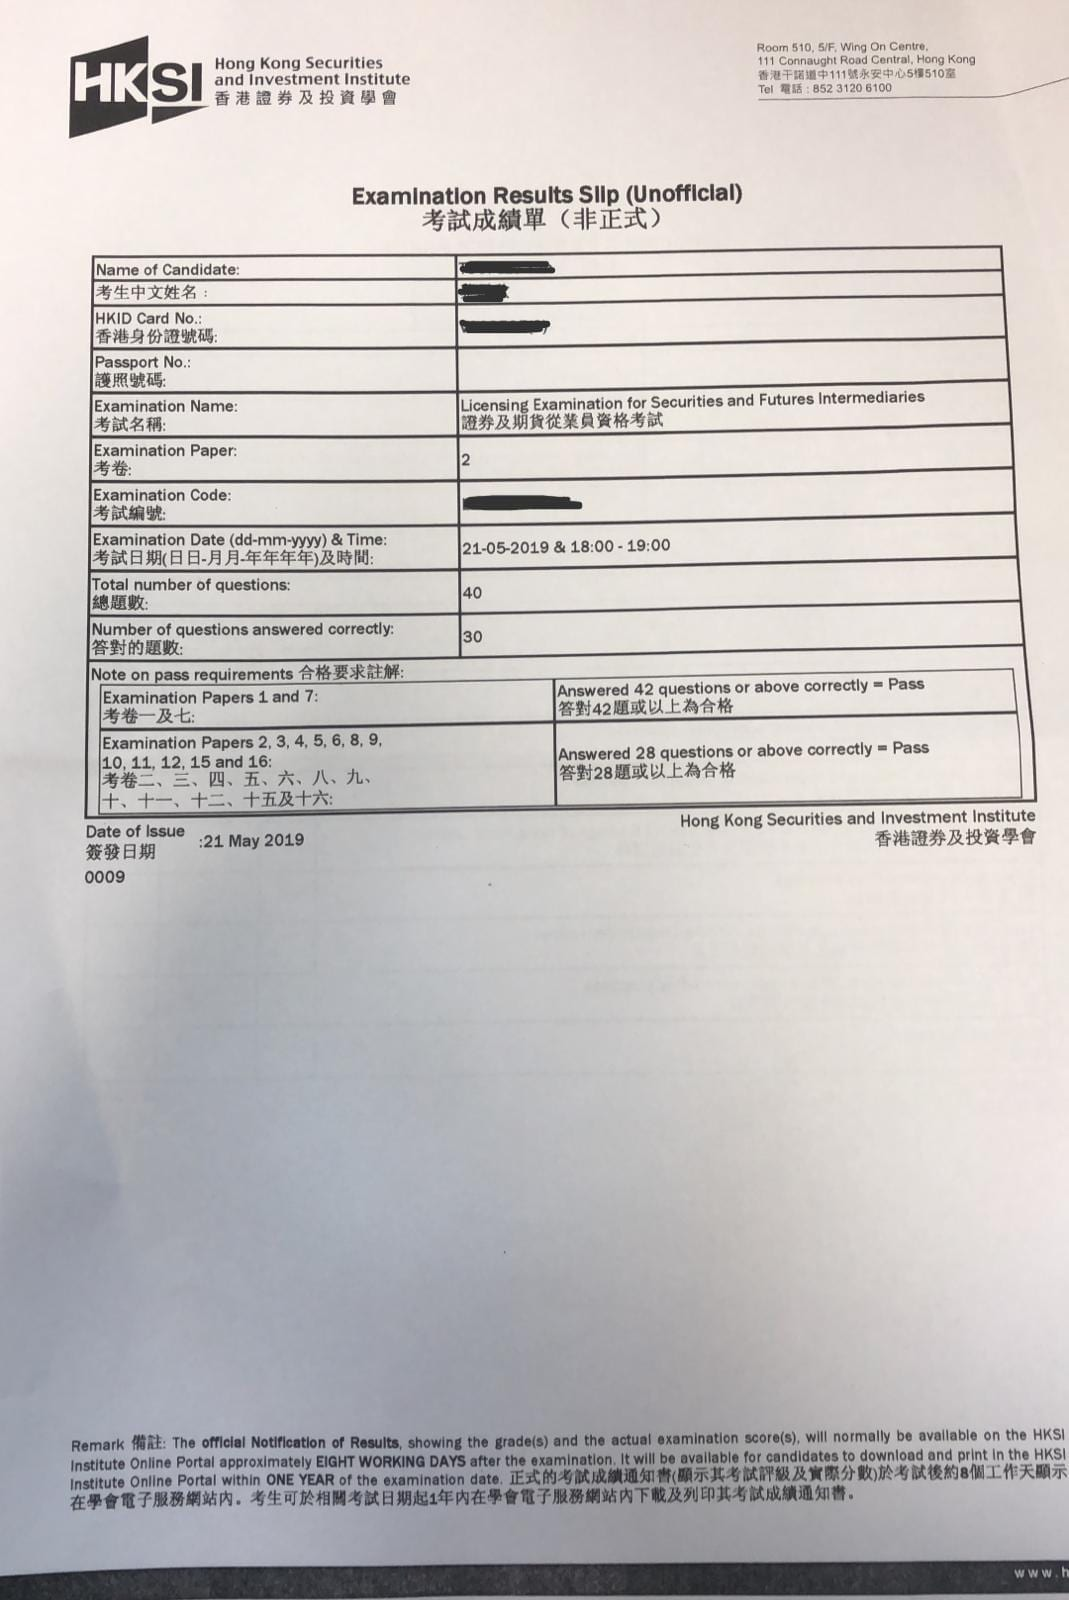 XXX 21/5/2019 LE Paper 2 證券期貨從業員資格考試卷二 Pass